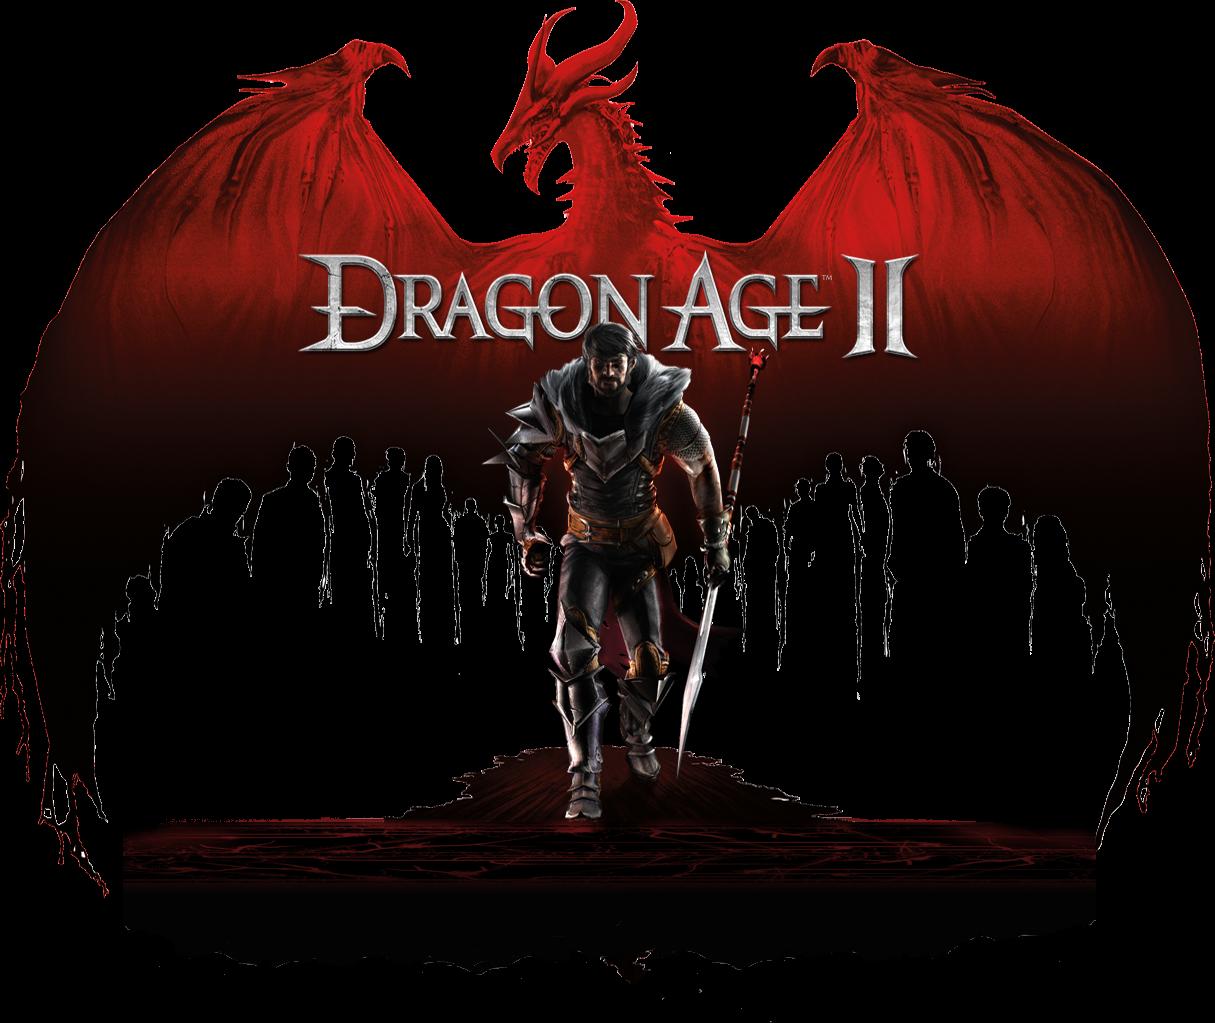 Dating Dragon Age 2